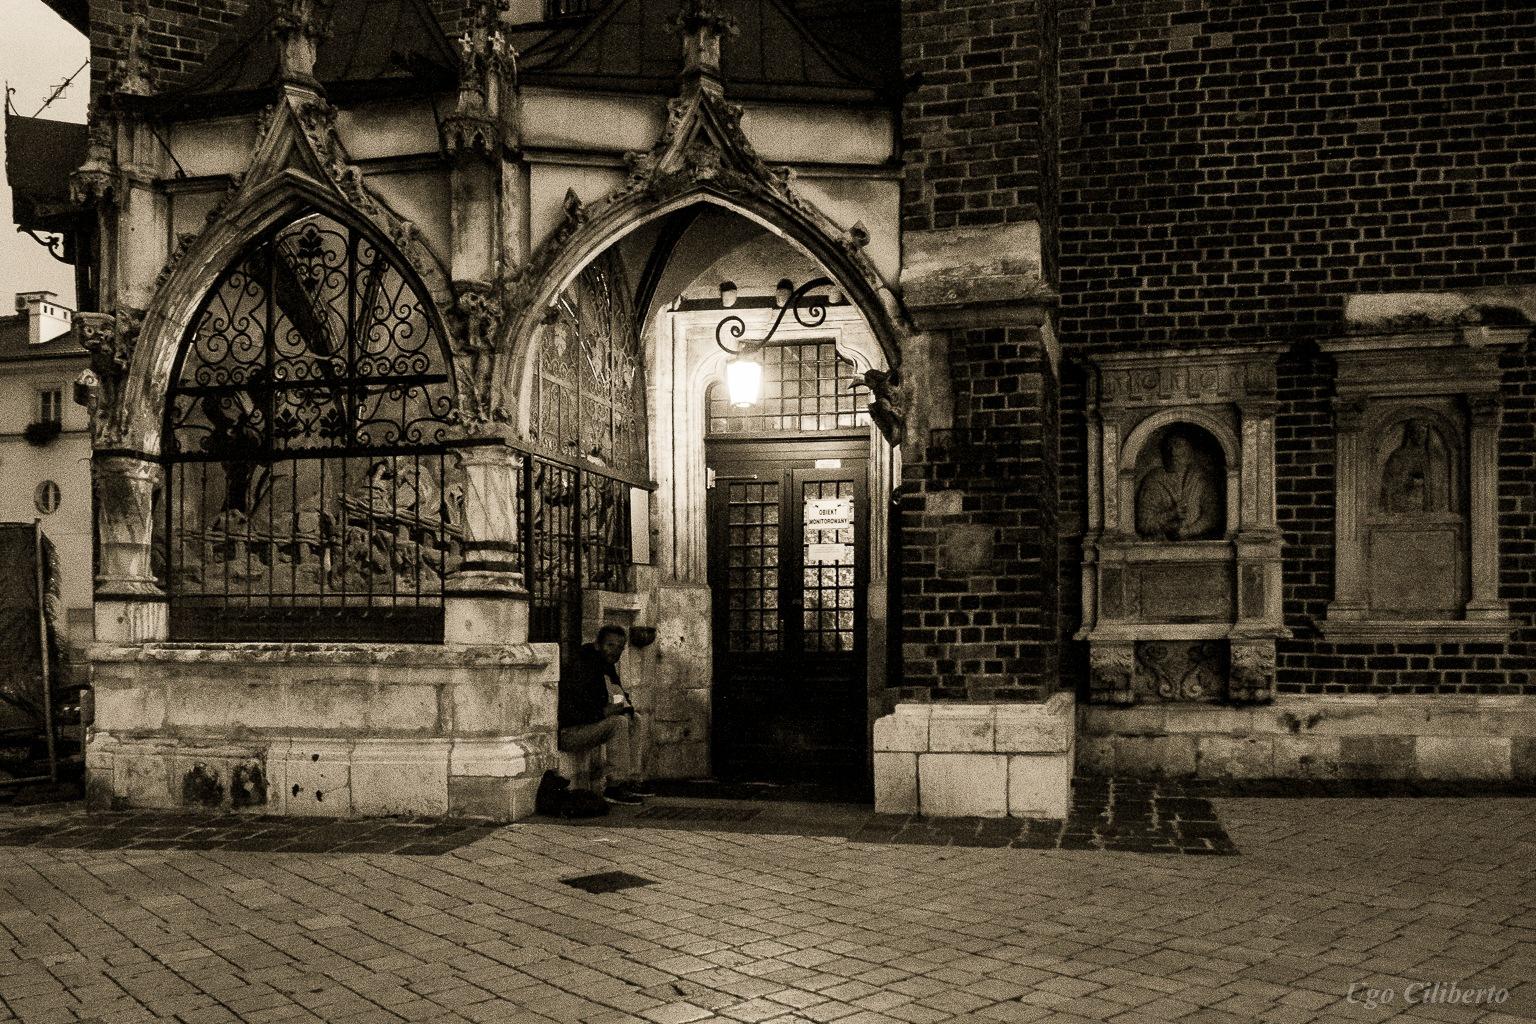 Cracovia - Chiesa di Santa Barbara by ugo